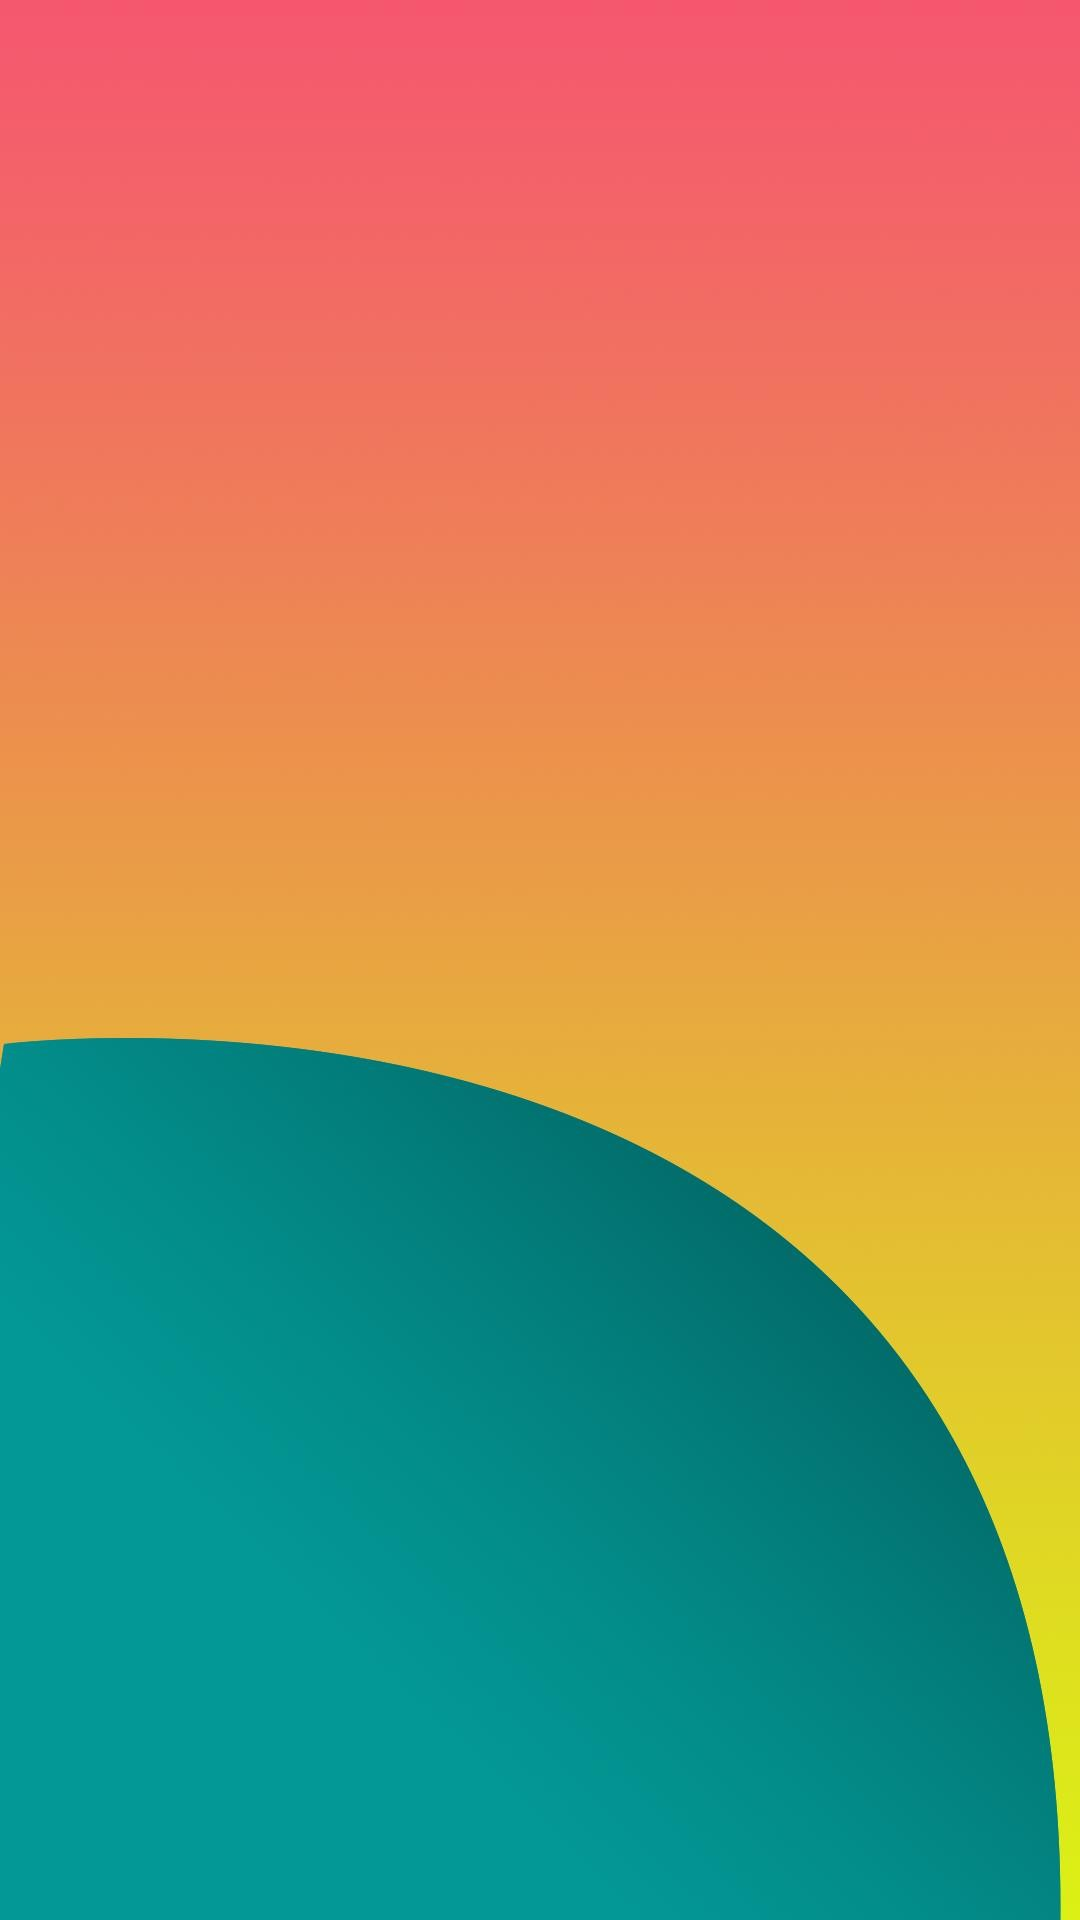 Creative:hd Nexus 5 Wallpaper   Data Src Free Download - Home Screen Android P - HD Wallpaper